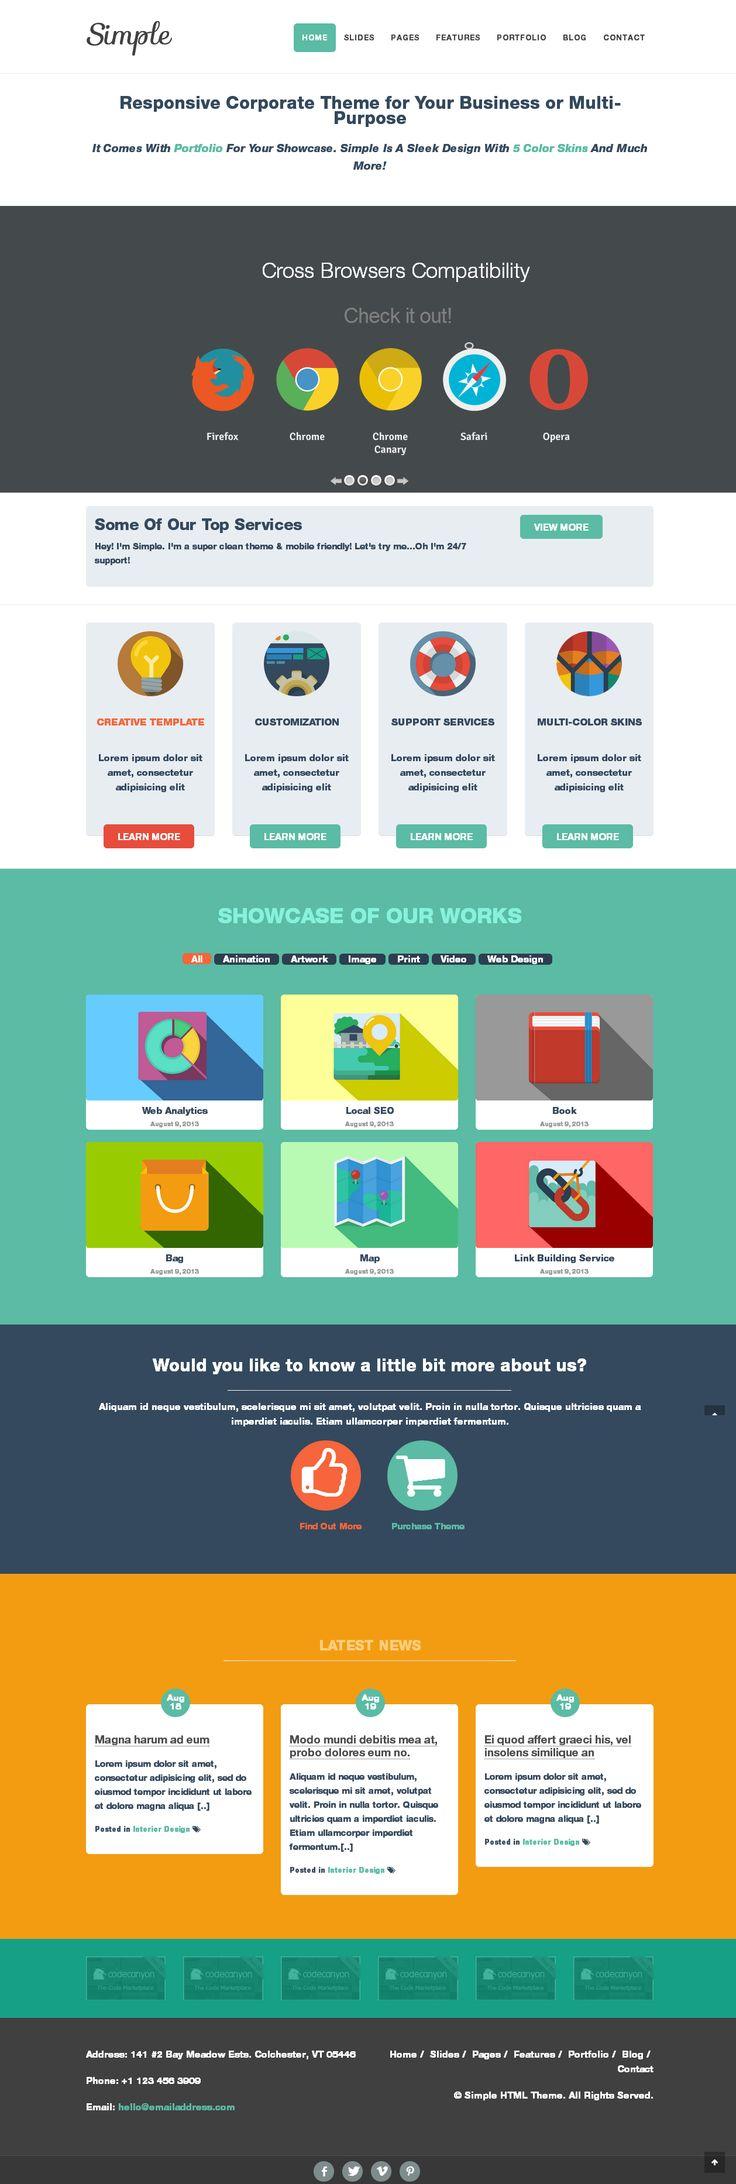 Simple | #responsive multi-purpose #corporate #theme, #flat #design, #LongShadow #icons | From #Themeforest  http://www.techirsh.com